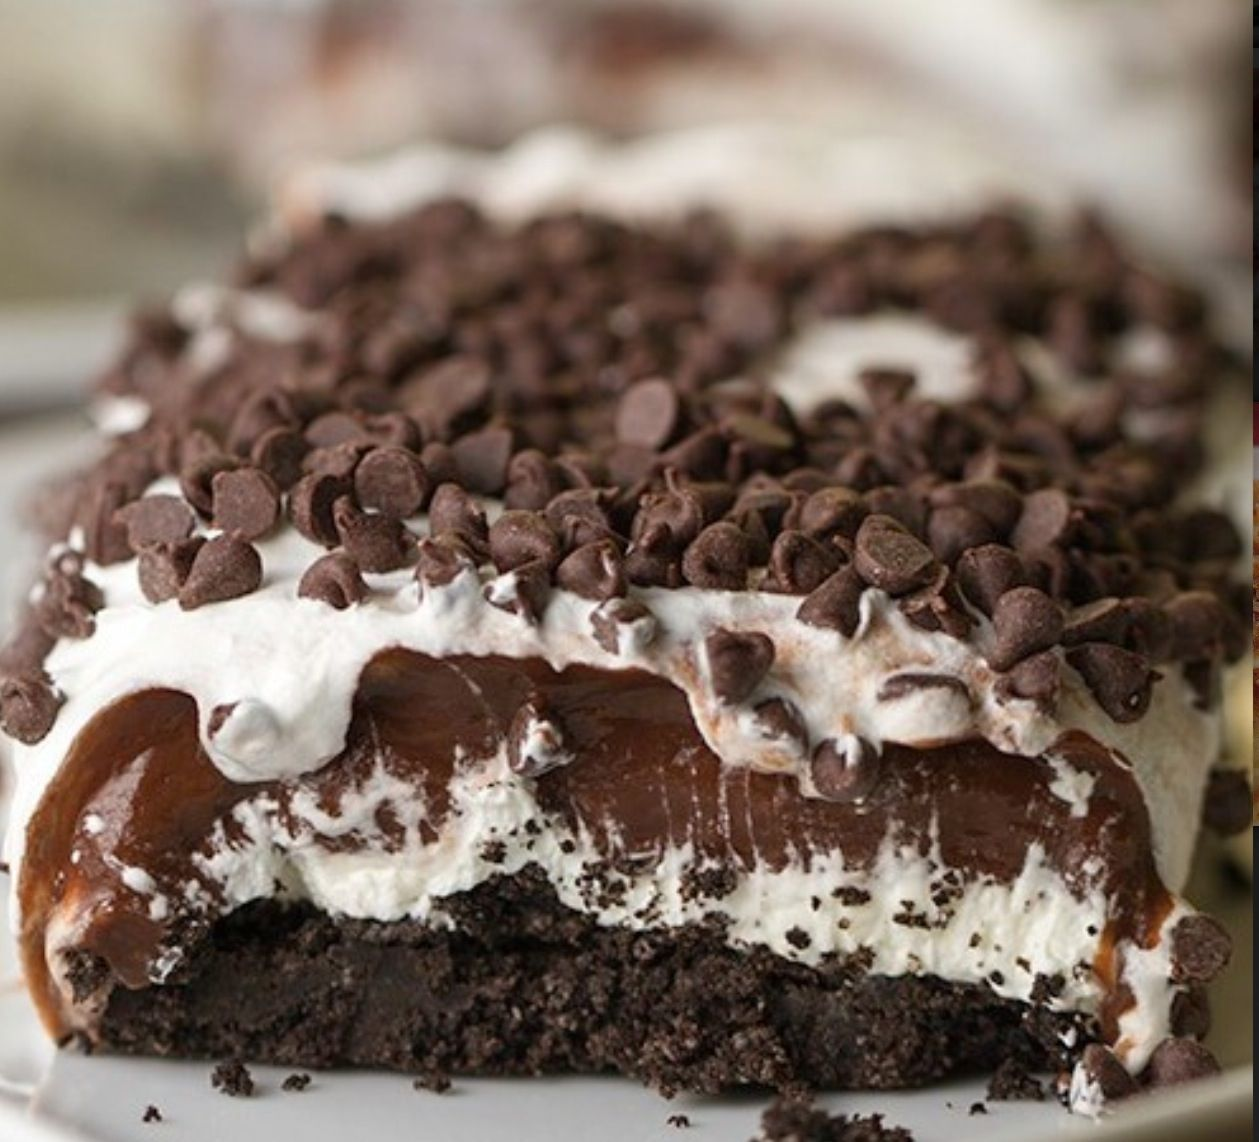 Yummy dessert!!